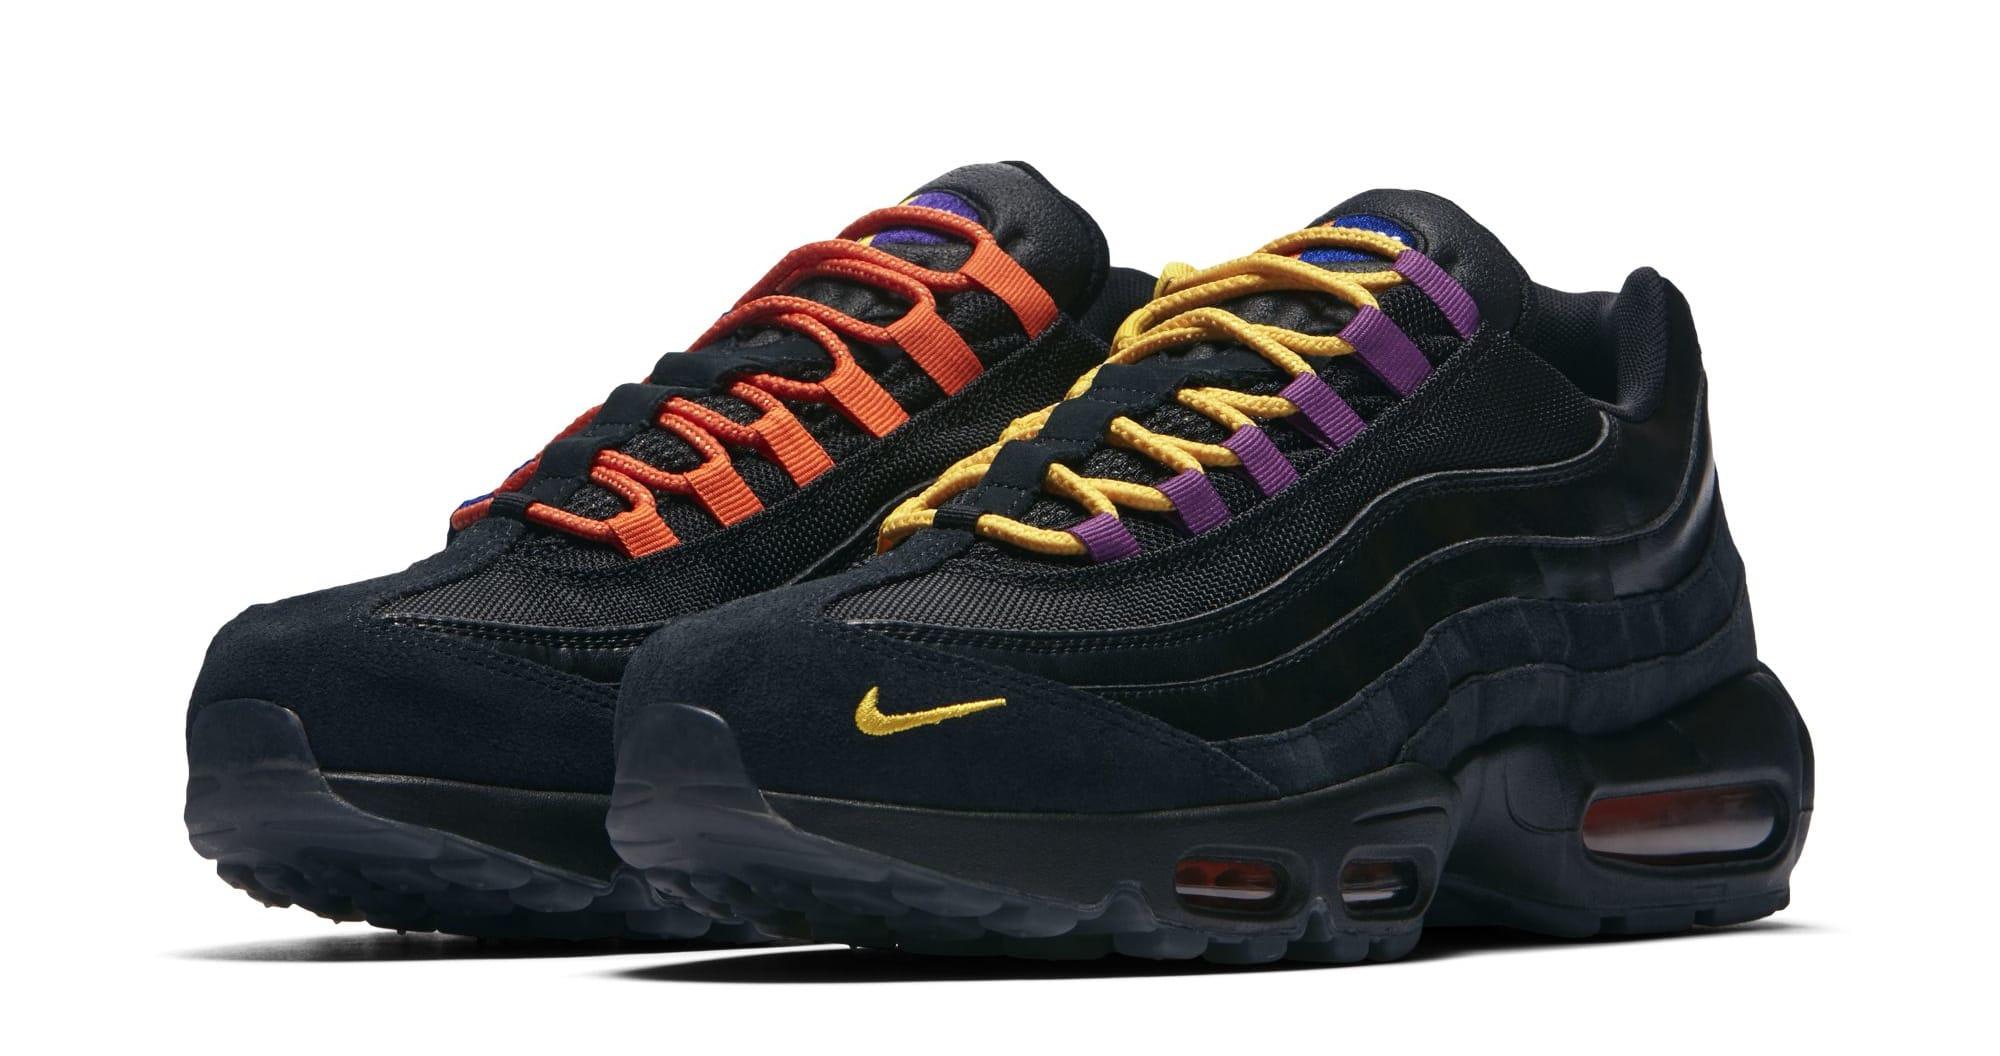 43e02c9cbe ... shoe 9cbc2 4247e real nike air max 95 ea5e4 945e7 ...